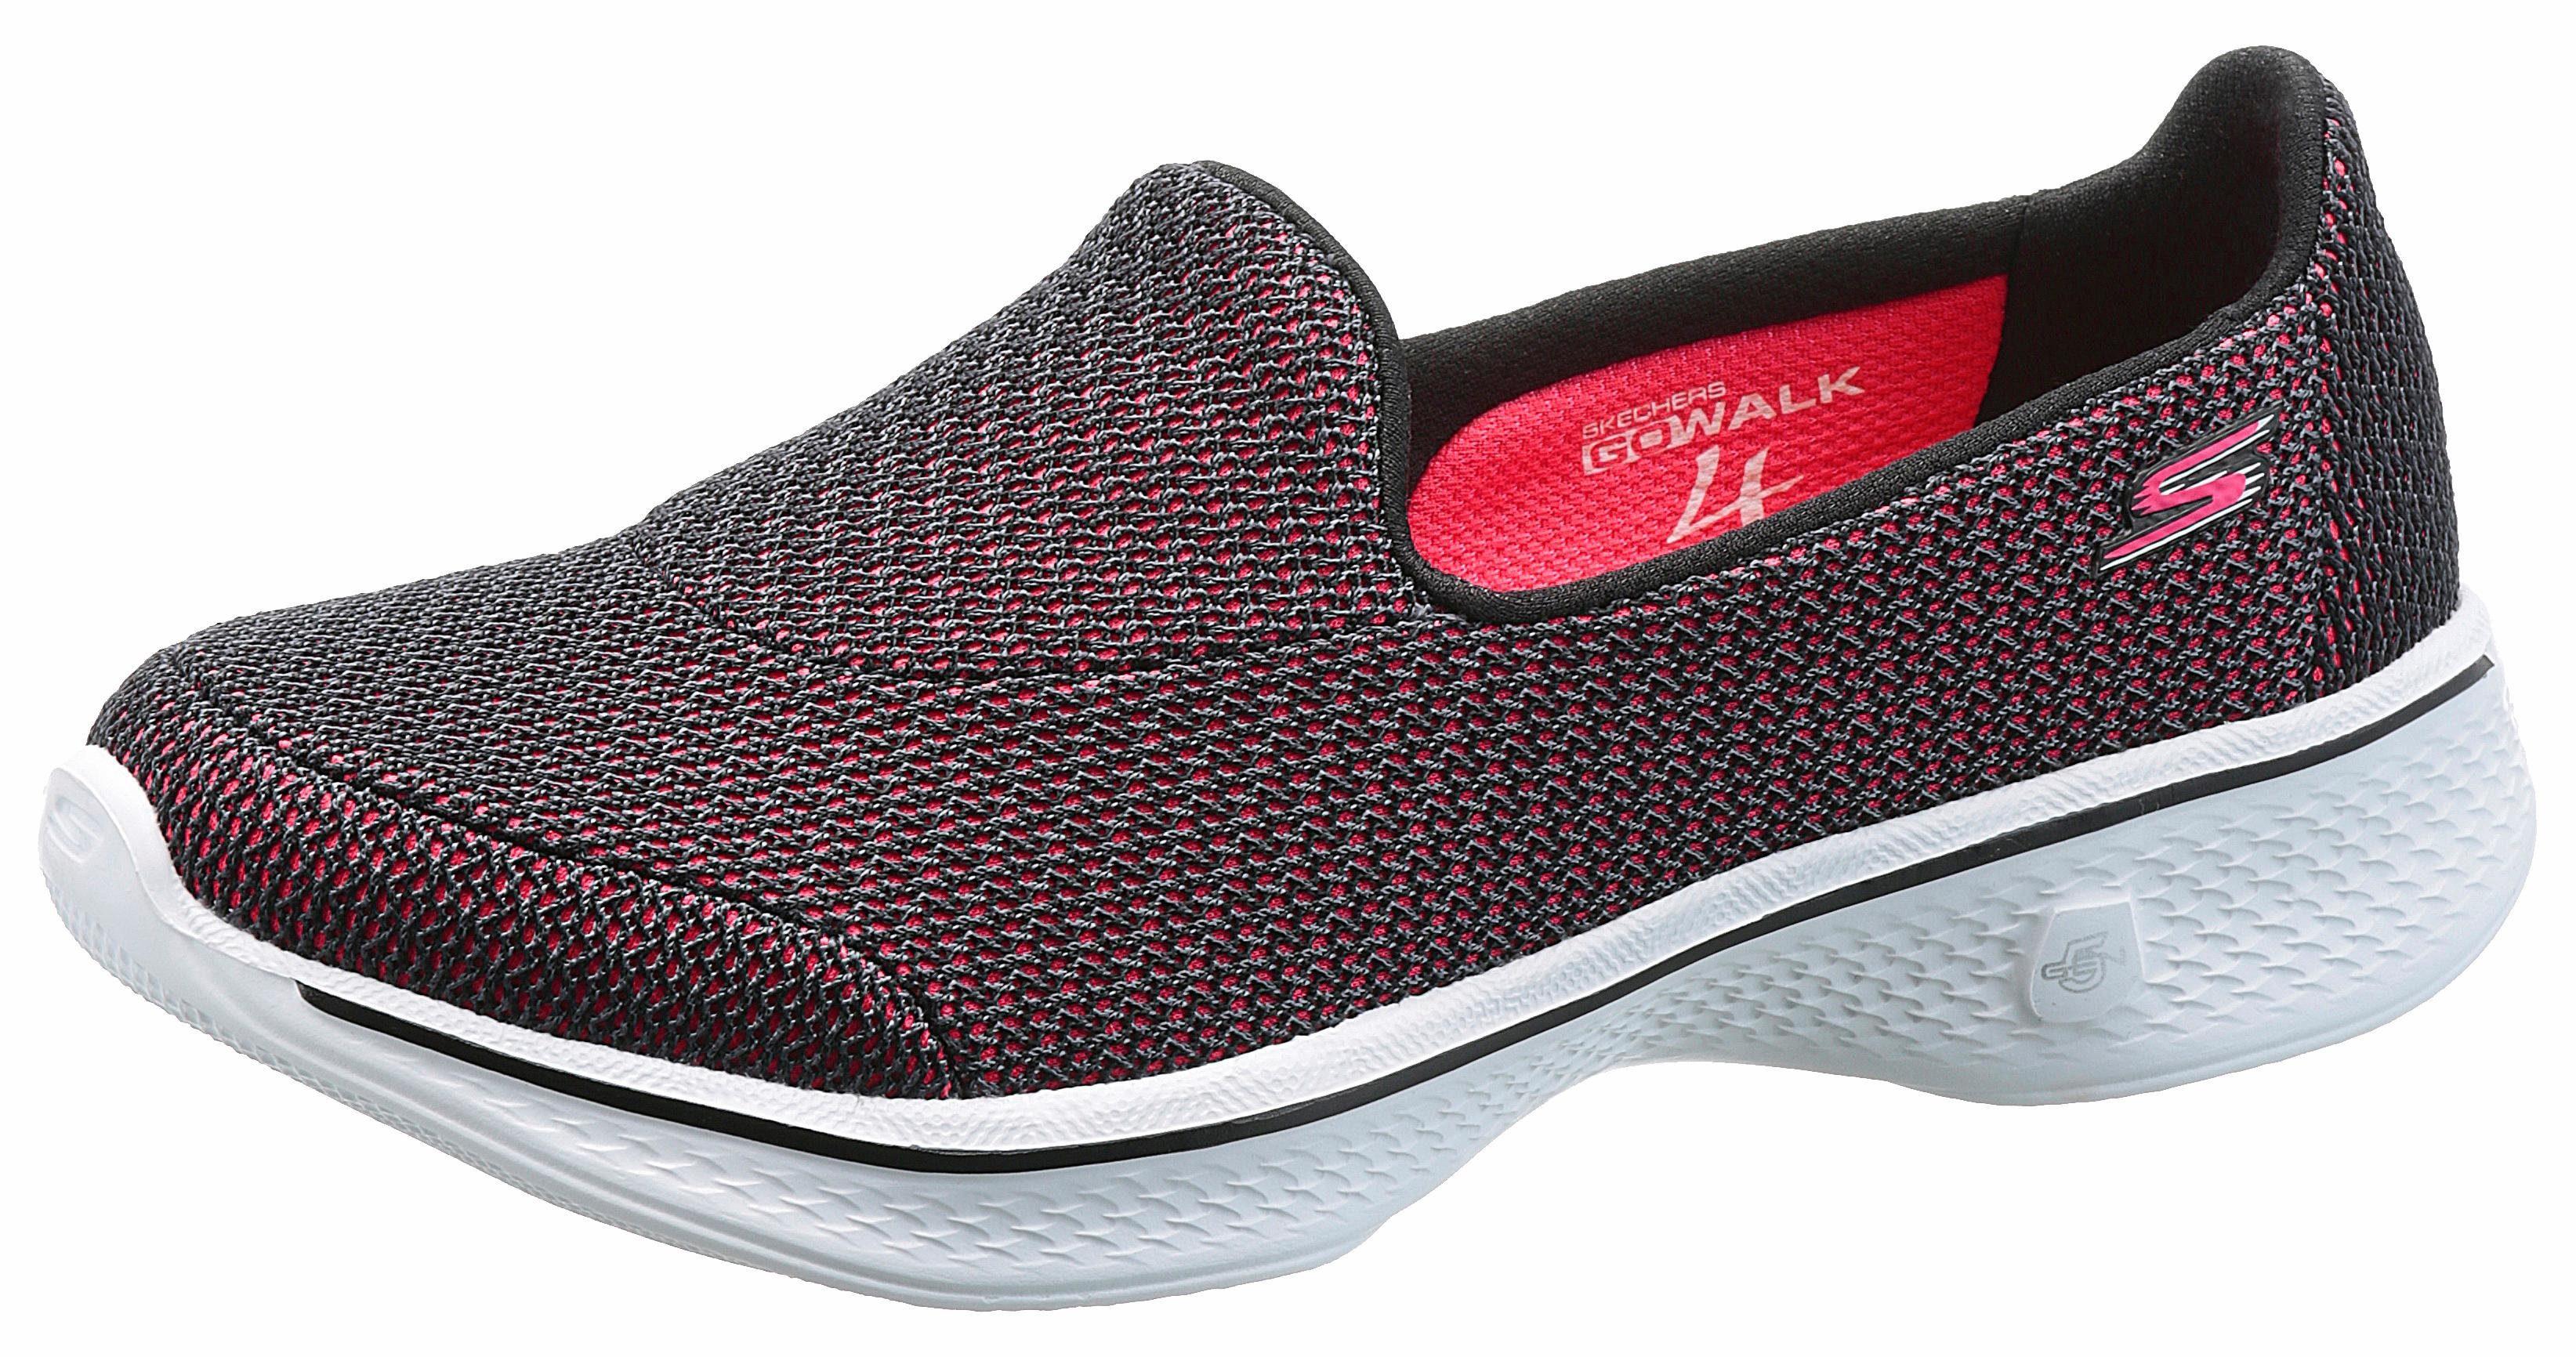 SKECHERS PERFORMANCE »Go Walk 4 Majestic« Sneaker, im sportlichen Design, schwarz, 40 40